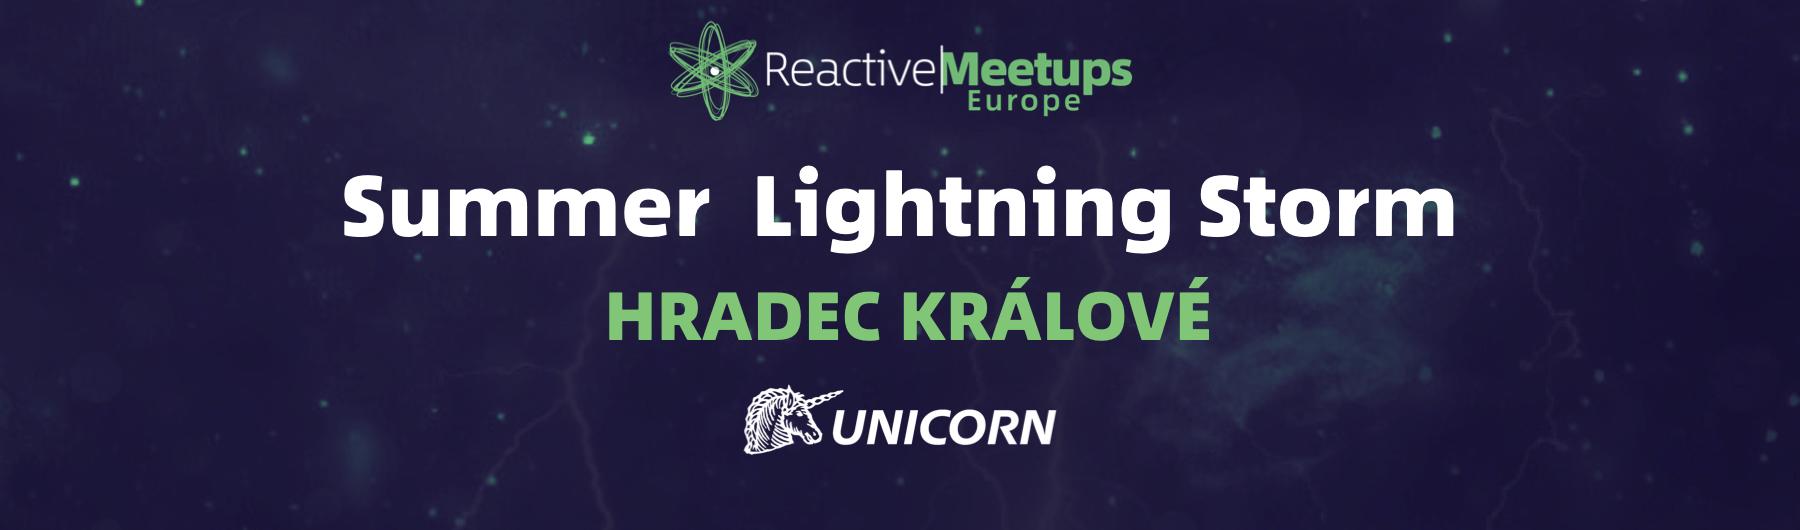 Summer Lightning Storm #2 Hradec Králové